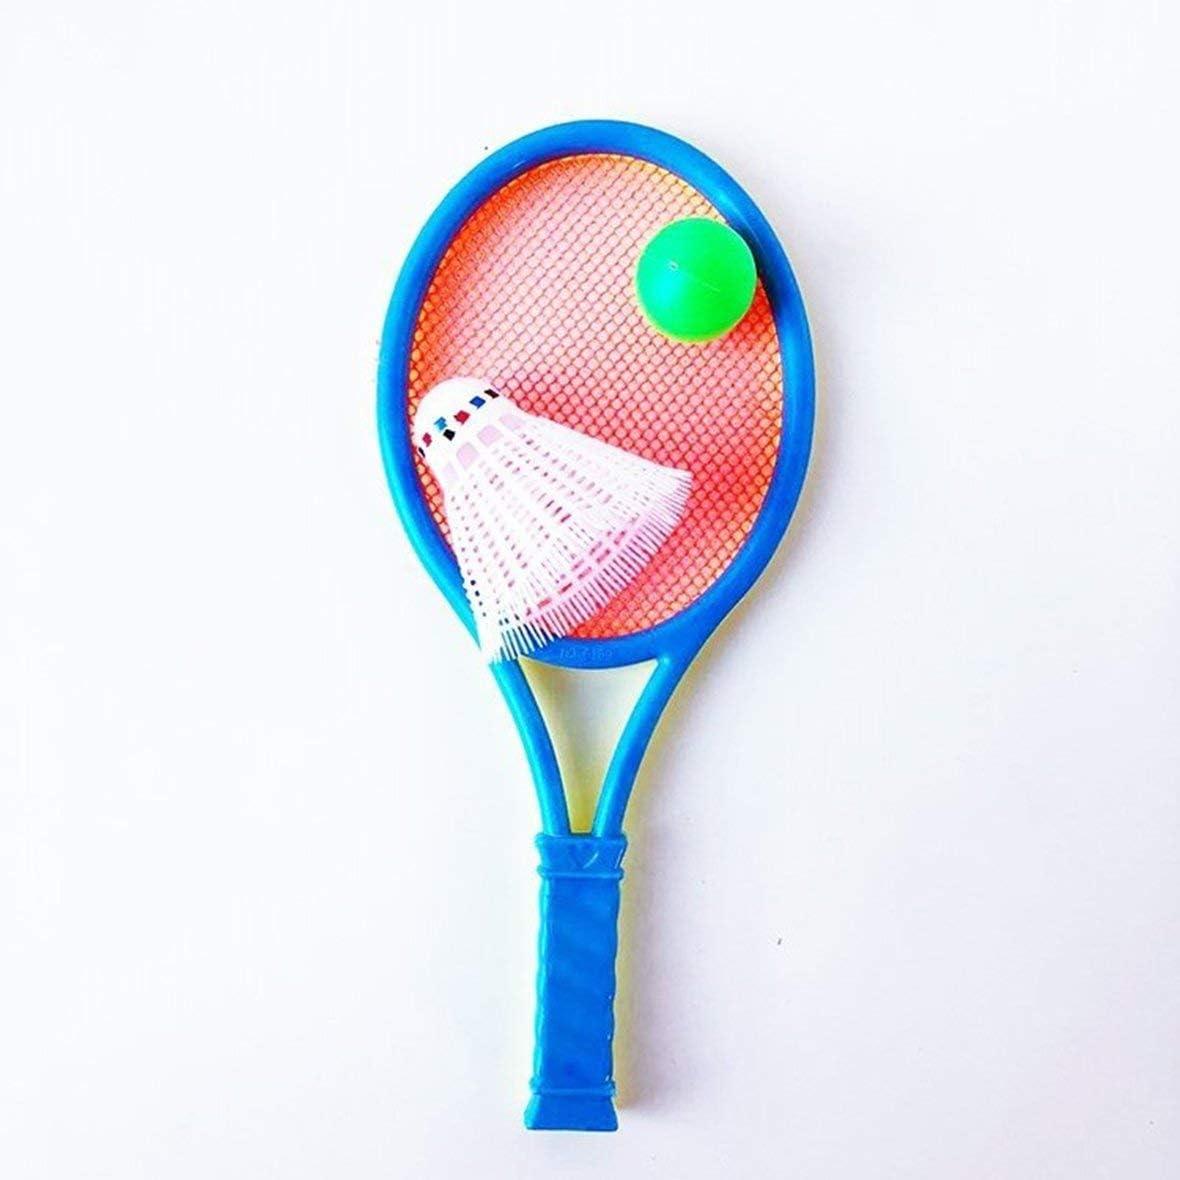 Heaviesk Raqueta de bádminton Juguetes para niños Raqueta de Tenis Traje de Raqueta